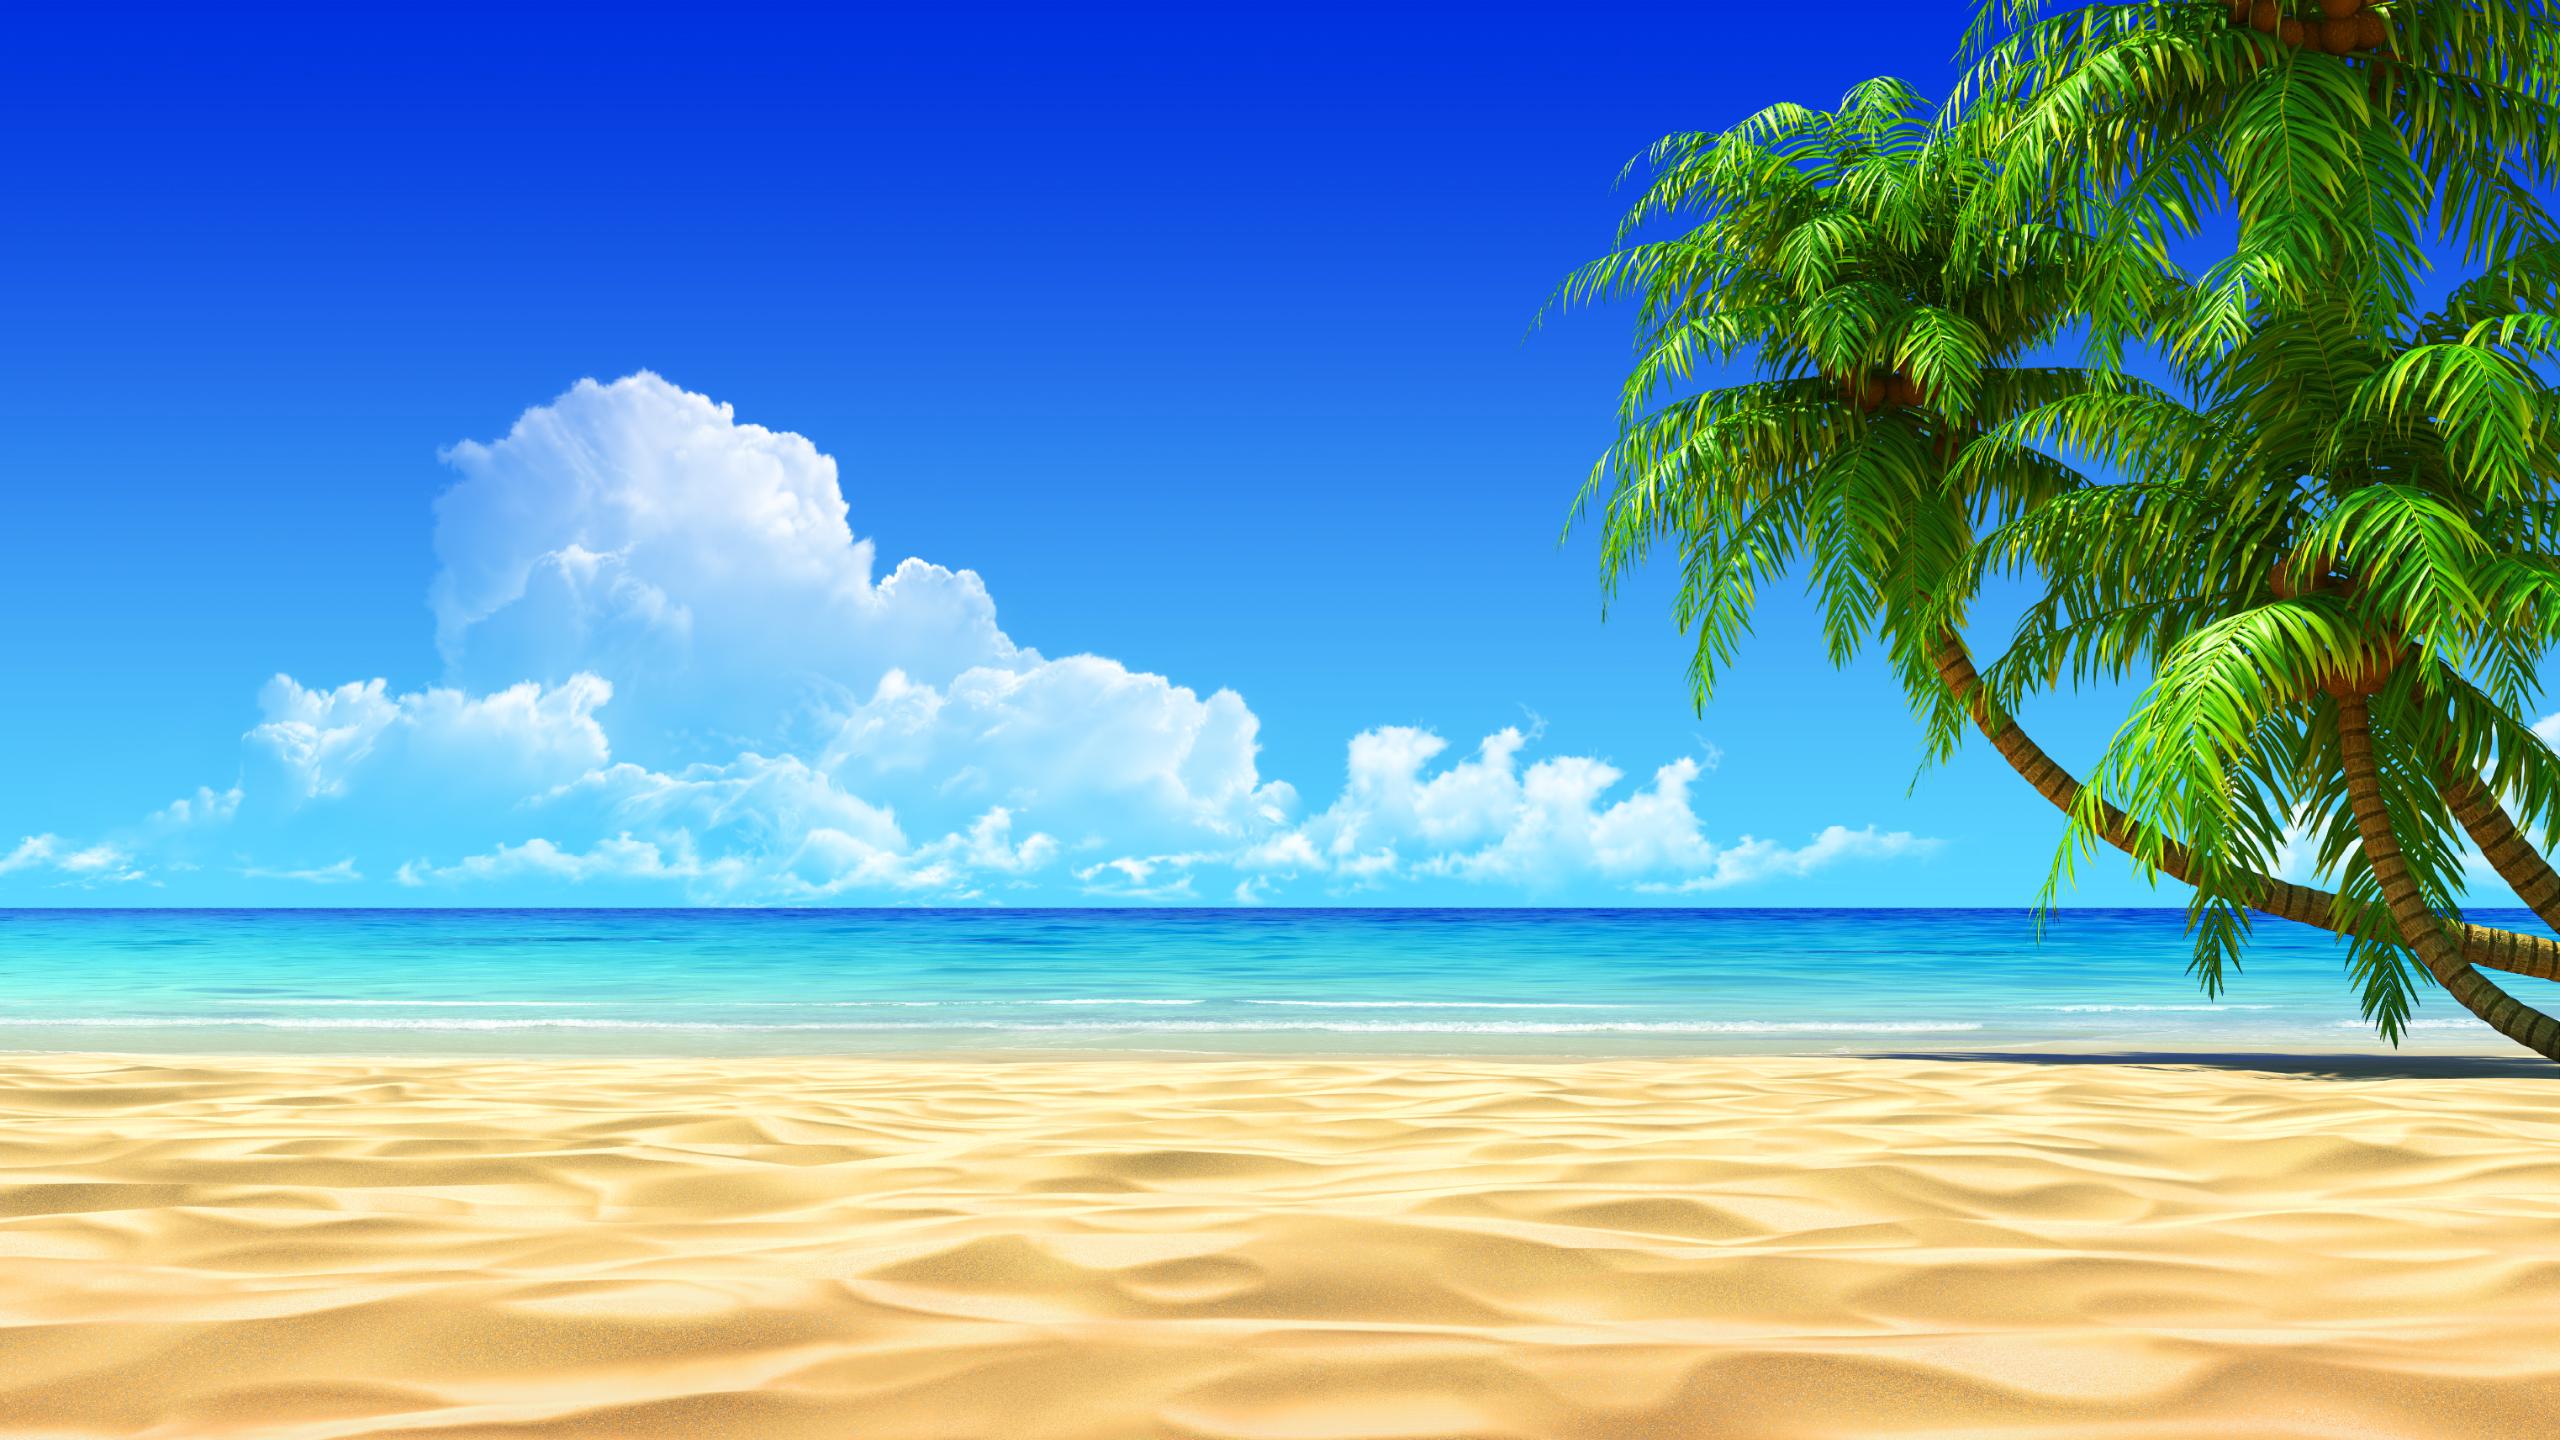 Pics Photos - Tropical Beach Background Wallpaper